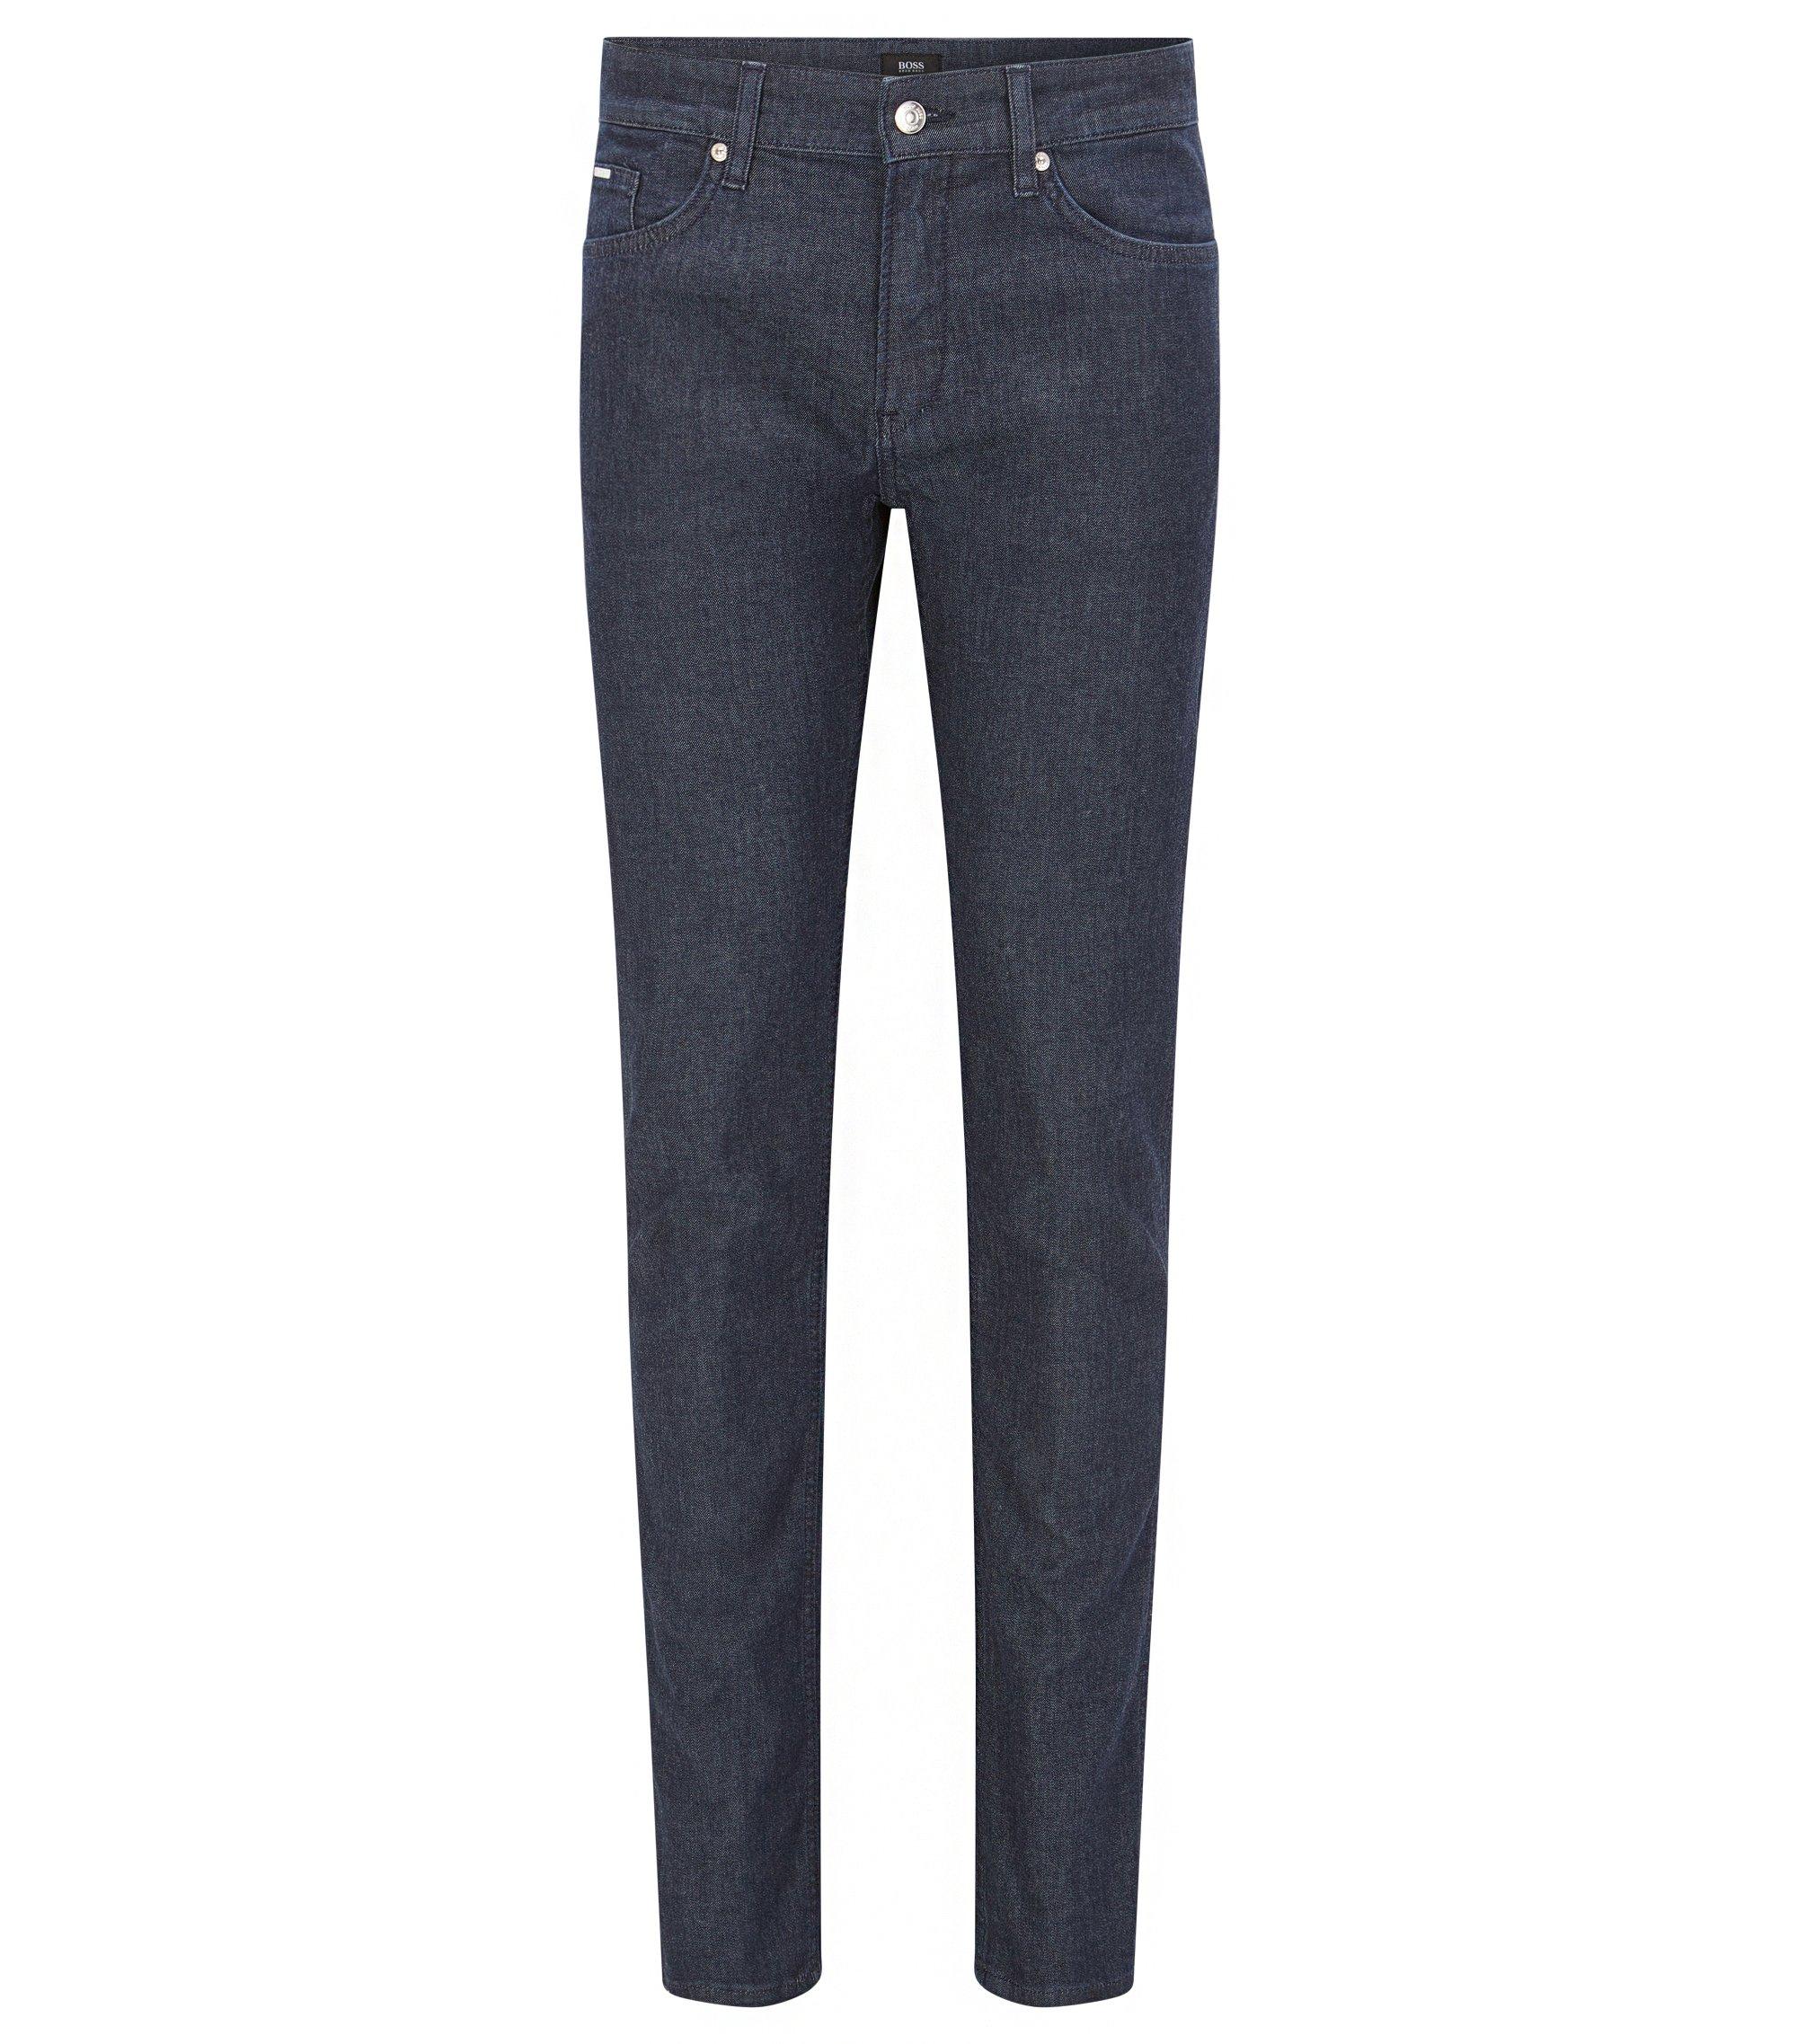 Slim-fit donkerblauwe jeans van stretchdenim , Donkerblauw